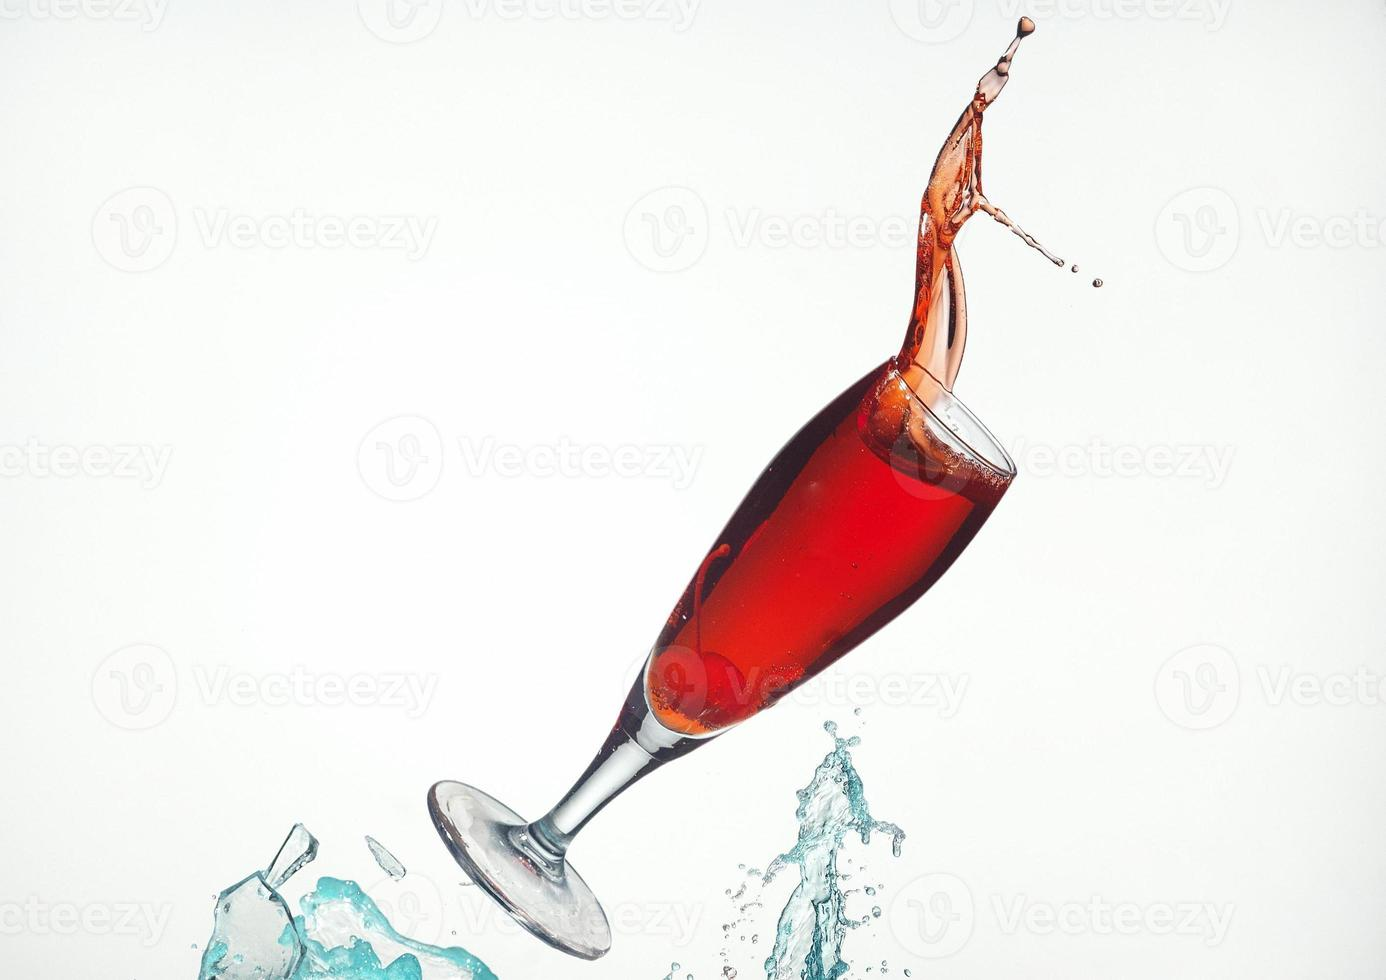 cocktaildrank smash foto